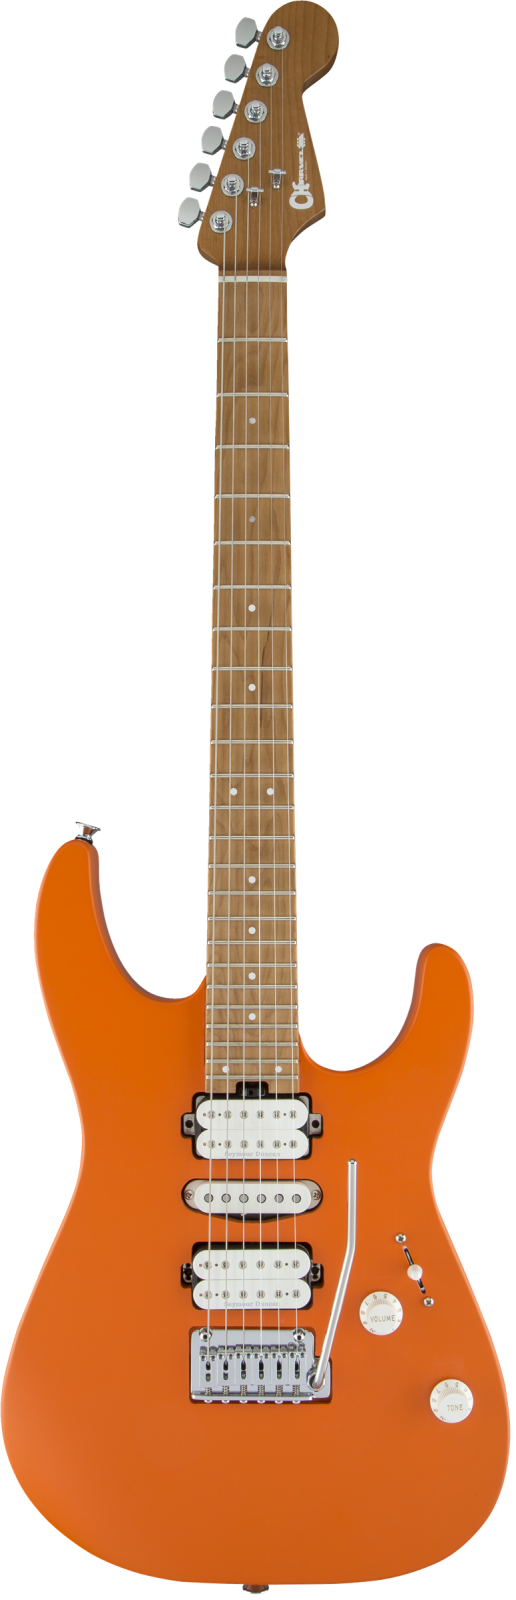 Charvel Pro-Mod DK24 HSH - Satin Orange Crush